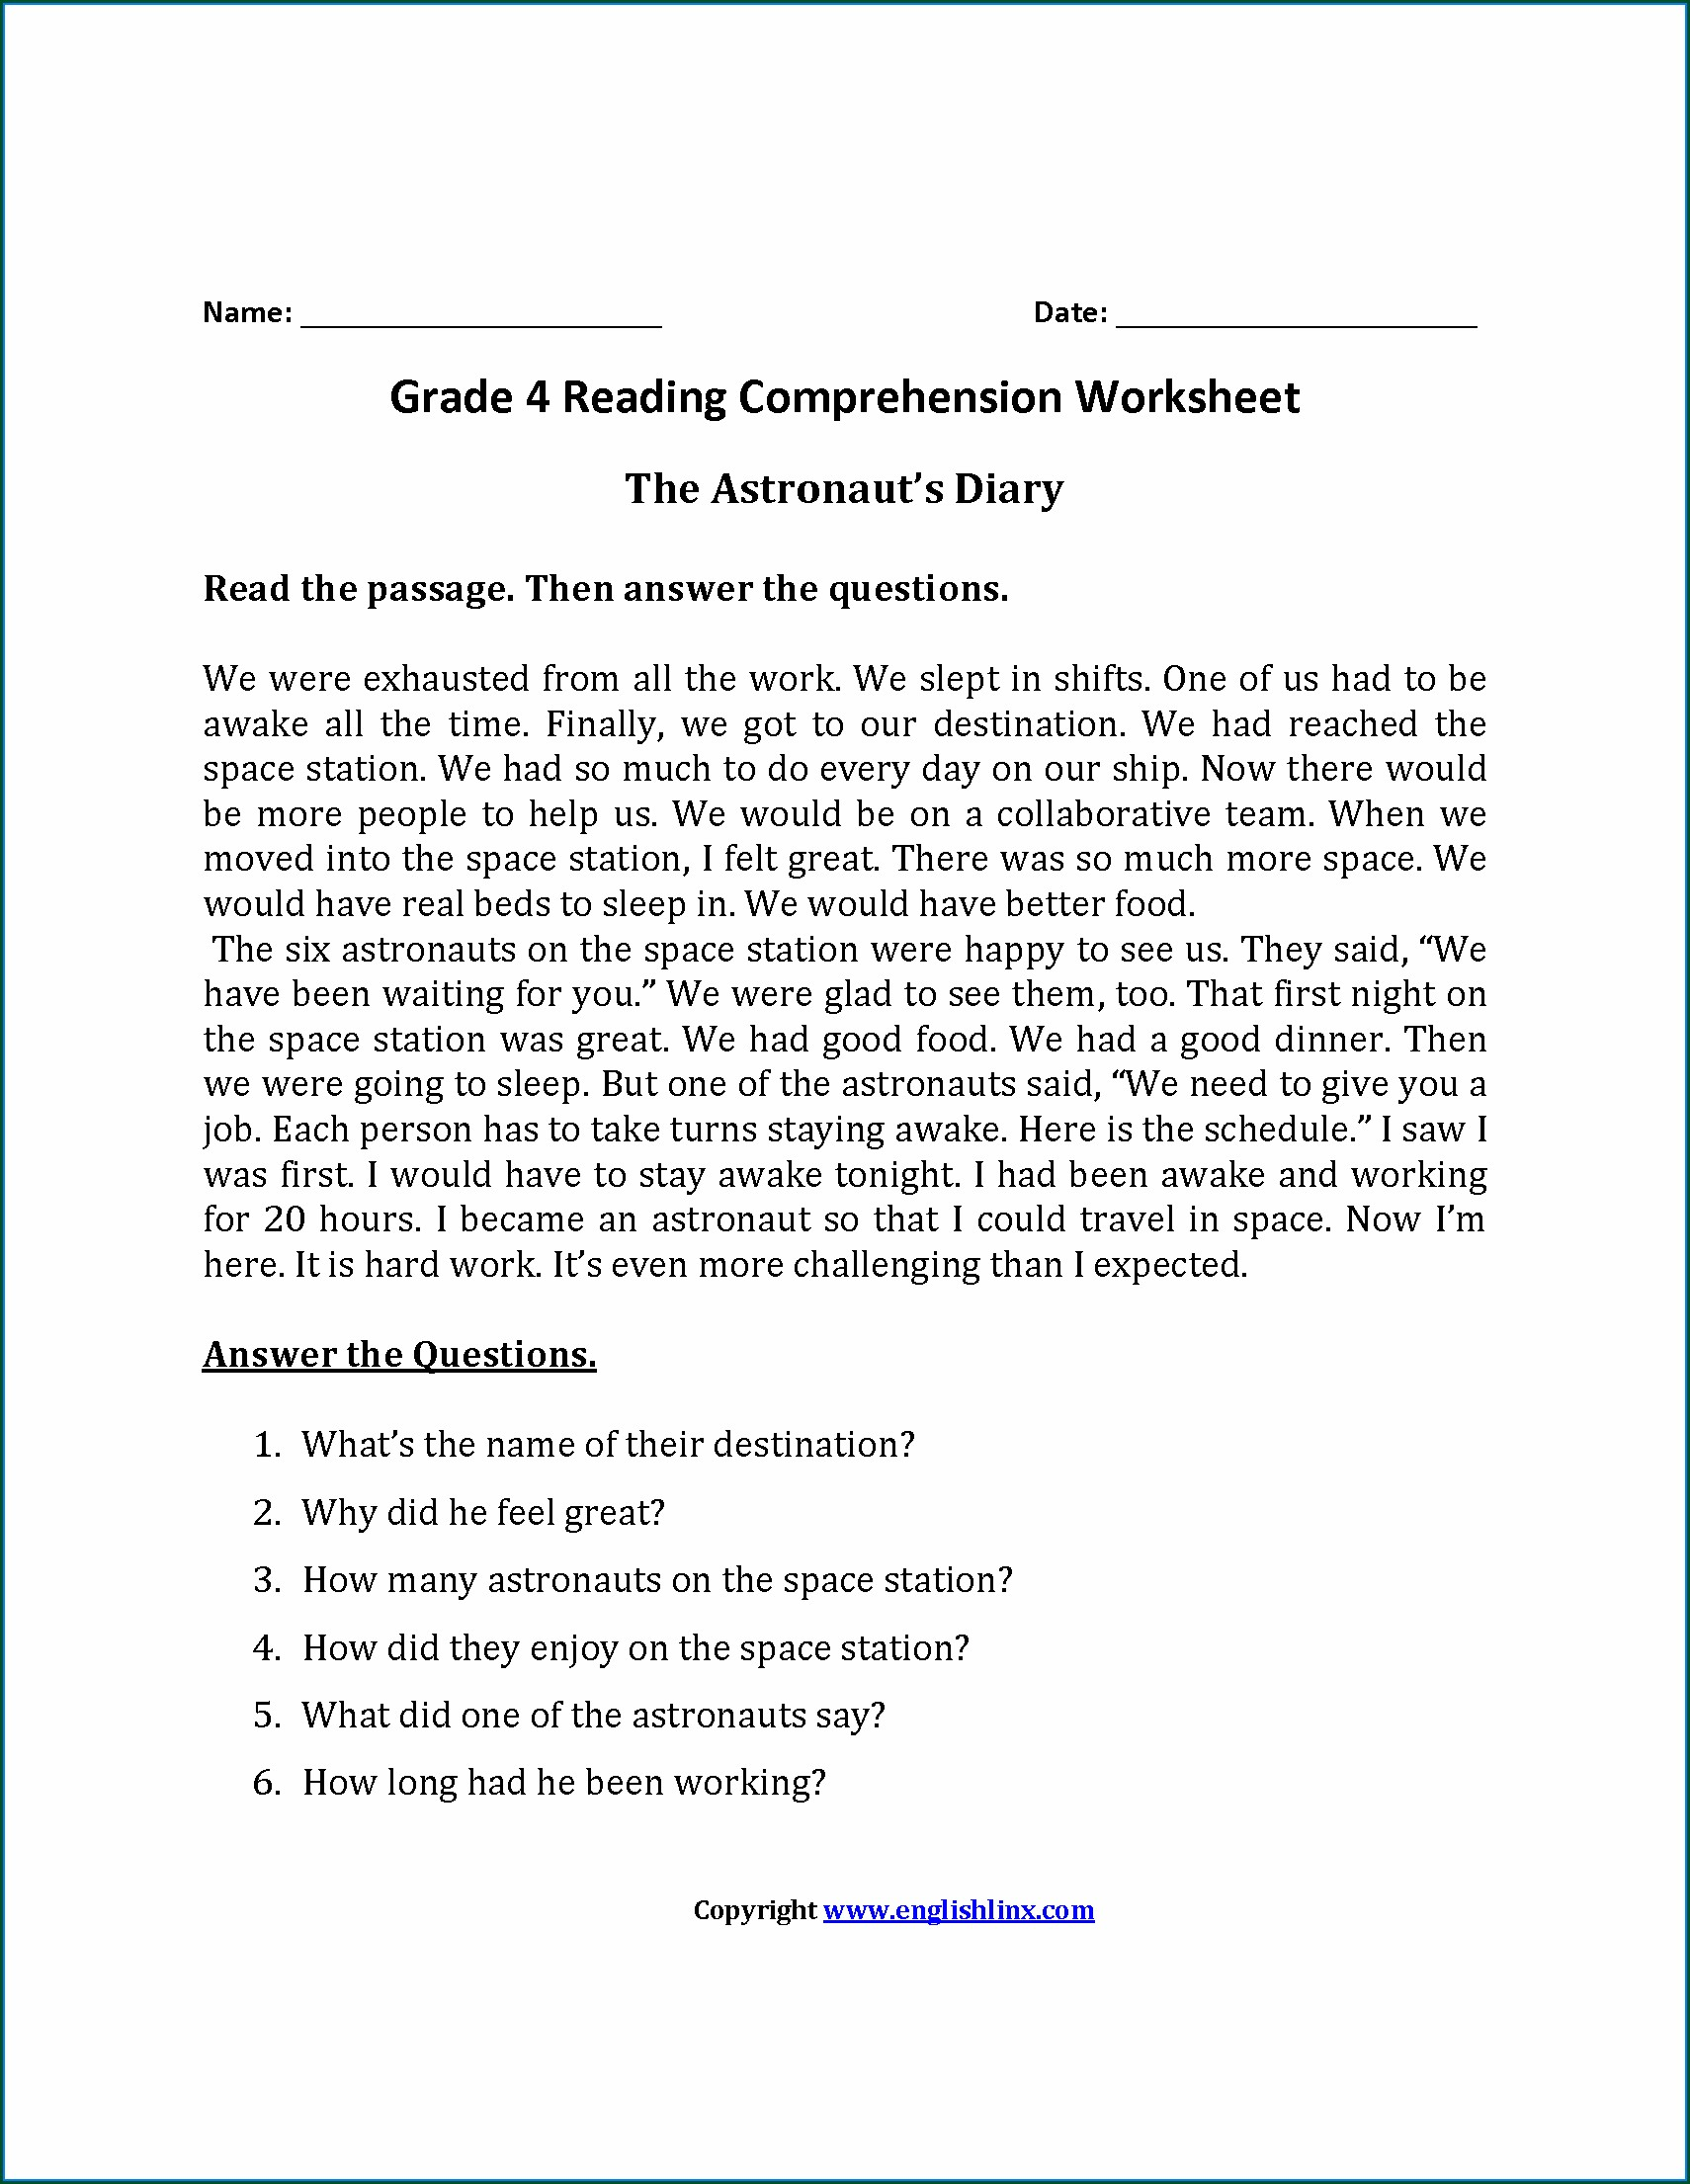 Worksheet For Year 5 Comprehension